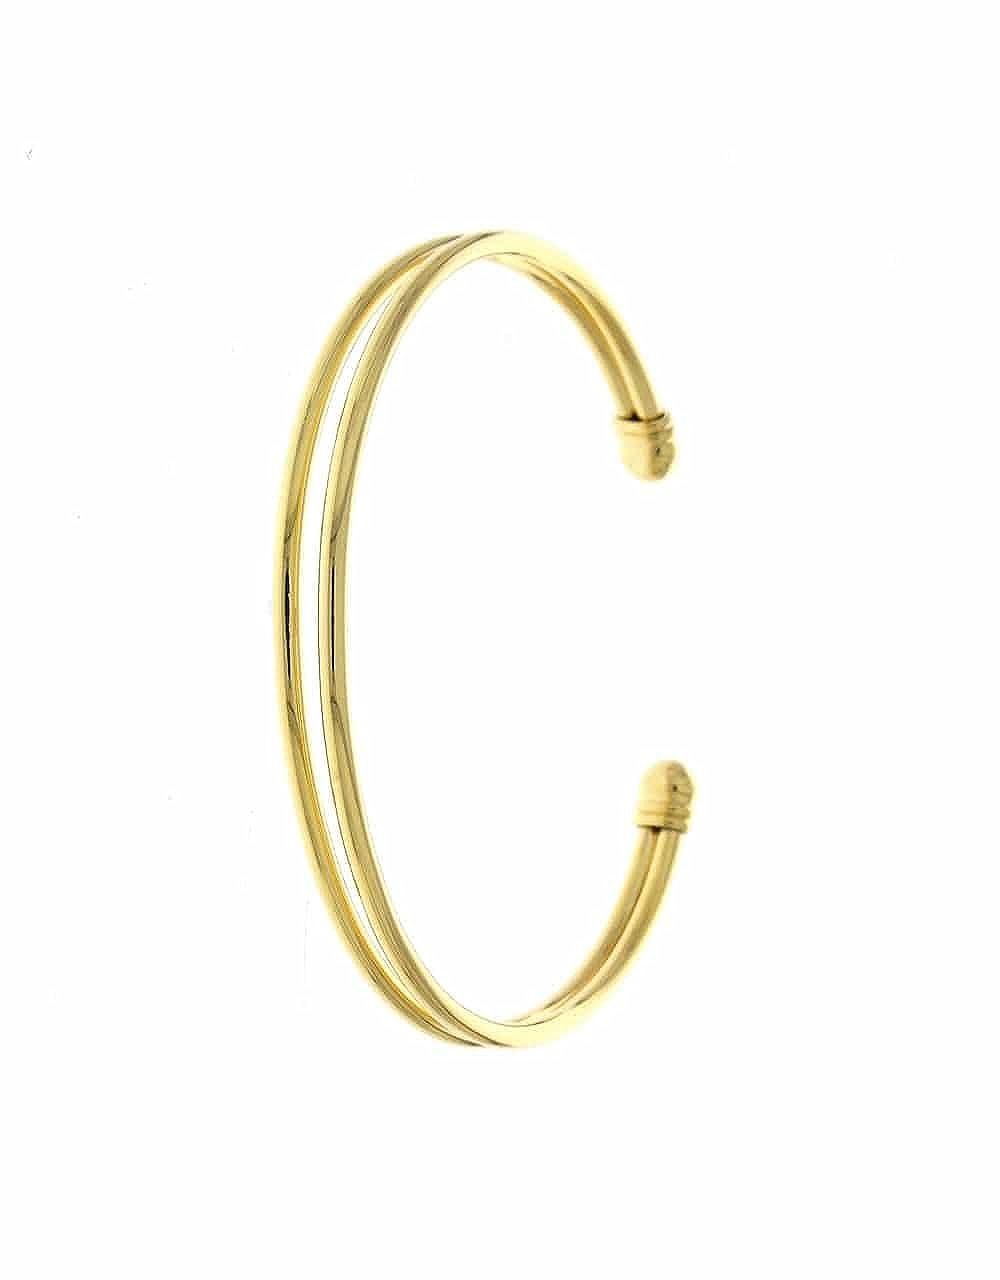 Anuradha Art Golden Finish Simple Designer Classy Stylish Kada//Hand Bracelet for Women//Girls